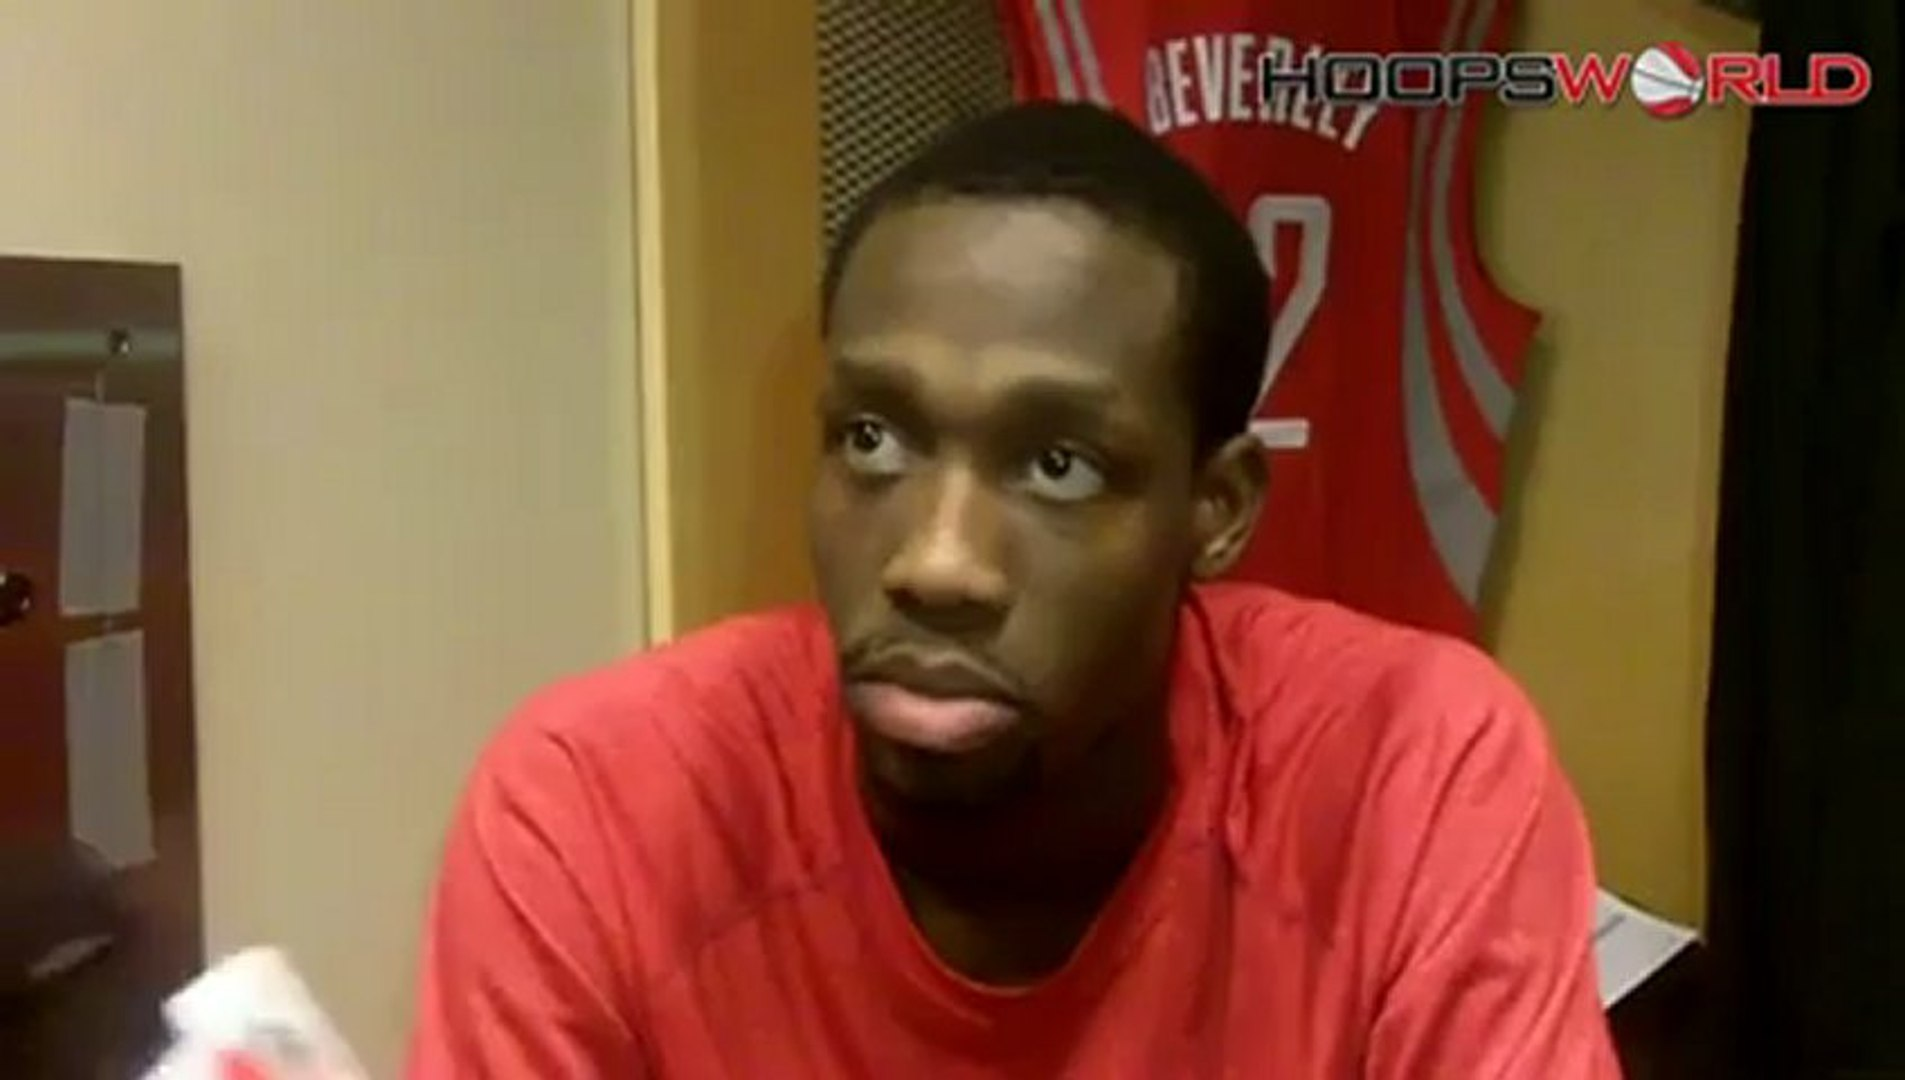 Patrick Beverley - Houston Rockets